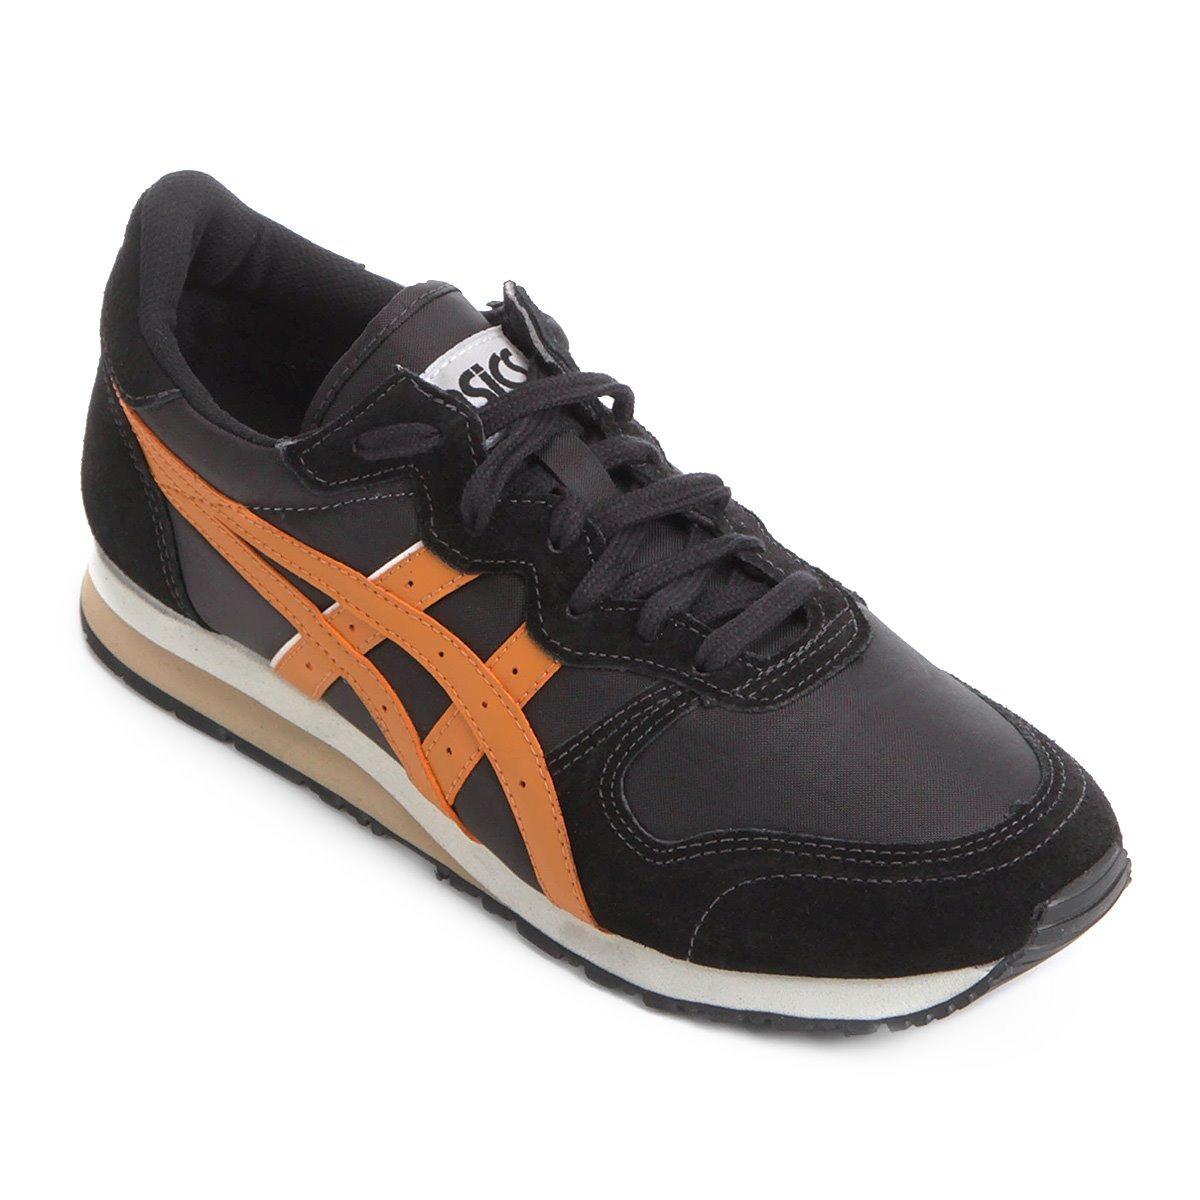 new style d7e76 e2e48 Tênis Asics Tiger Oc Runner Preto Sneakers Original + N F